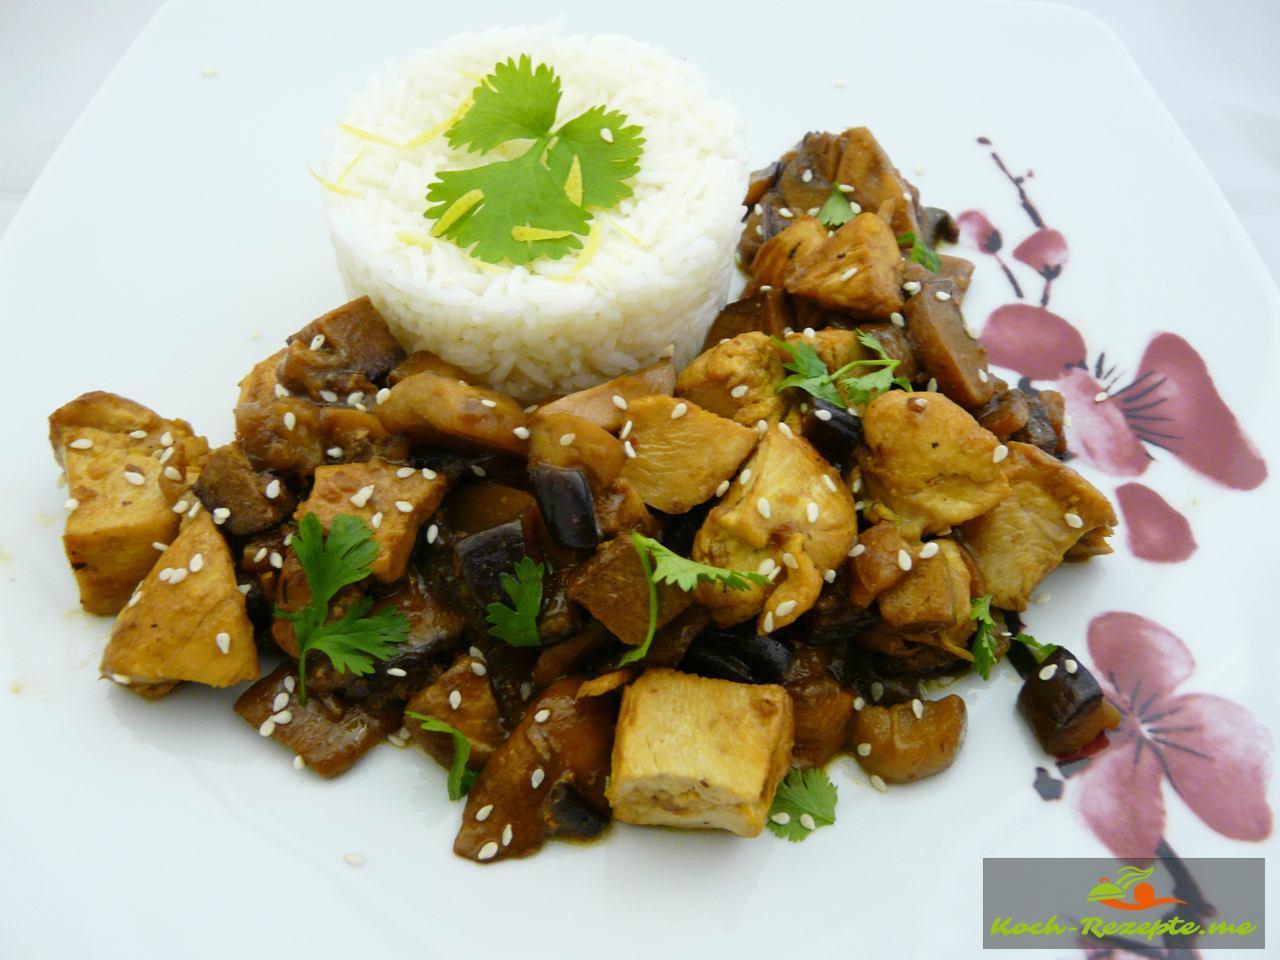 Wakadori-Hähnchen mit Tofu, Teriyaki-Sauce.